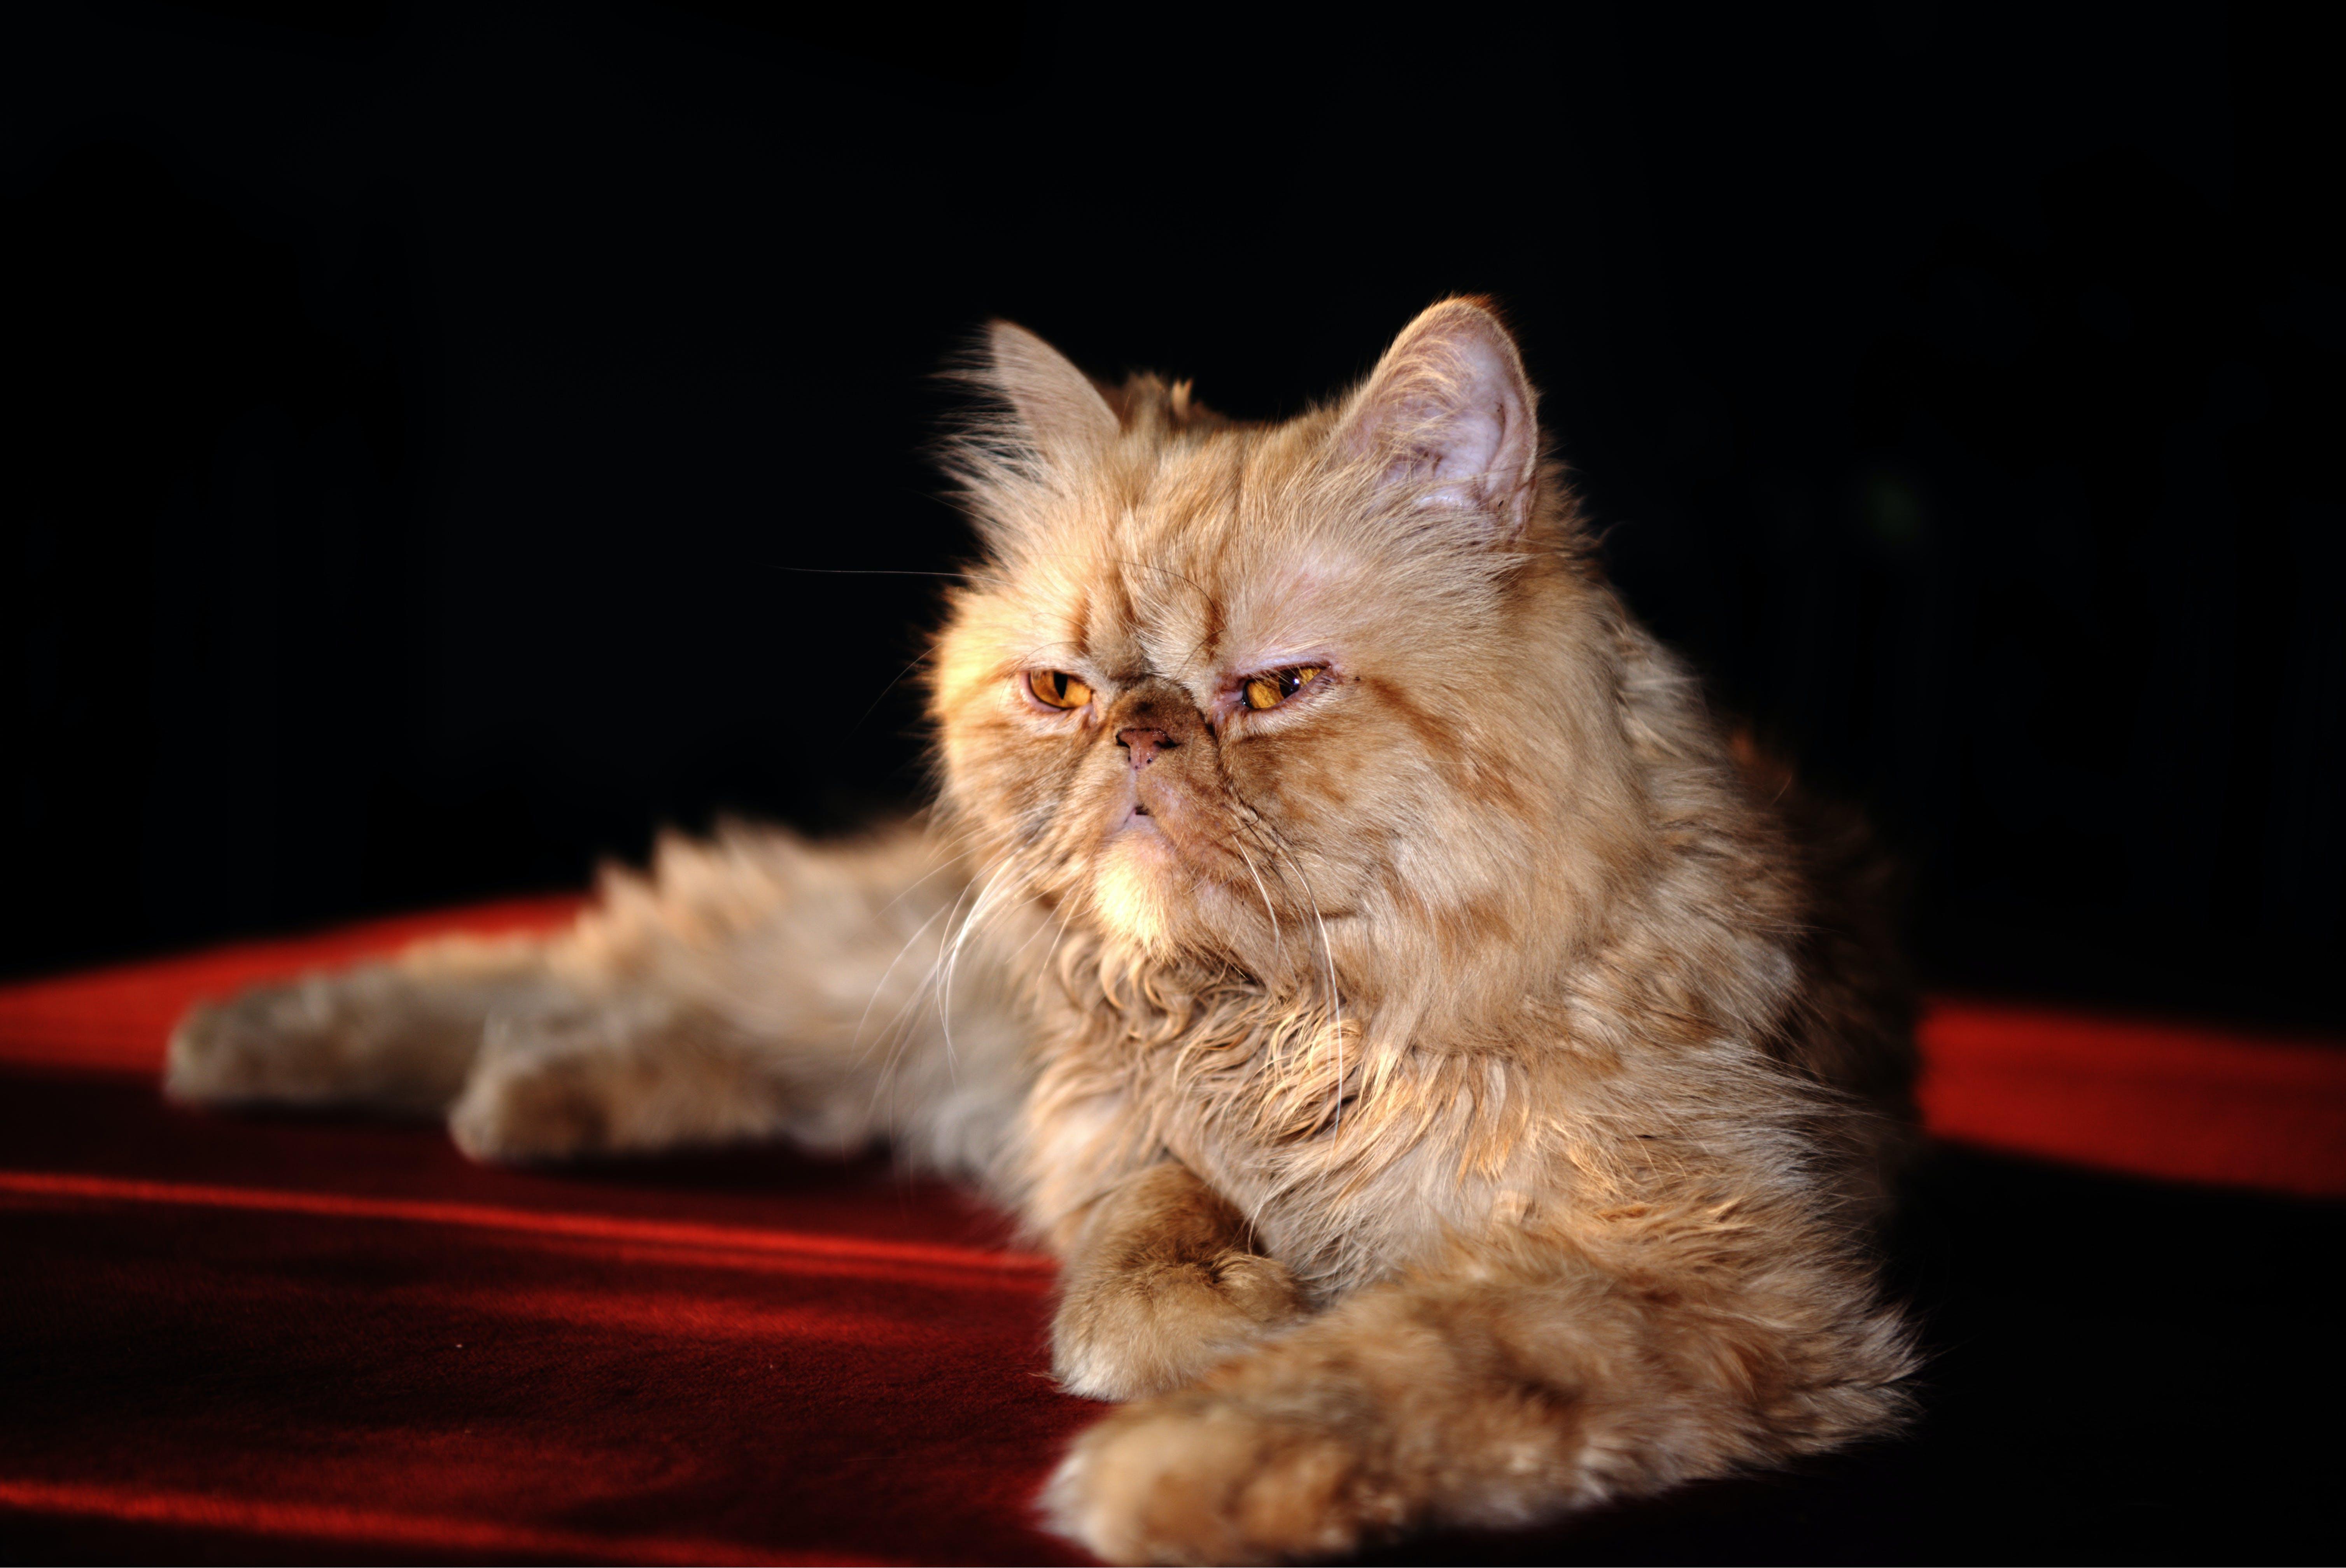 Free stock photo of Persian cat